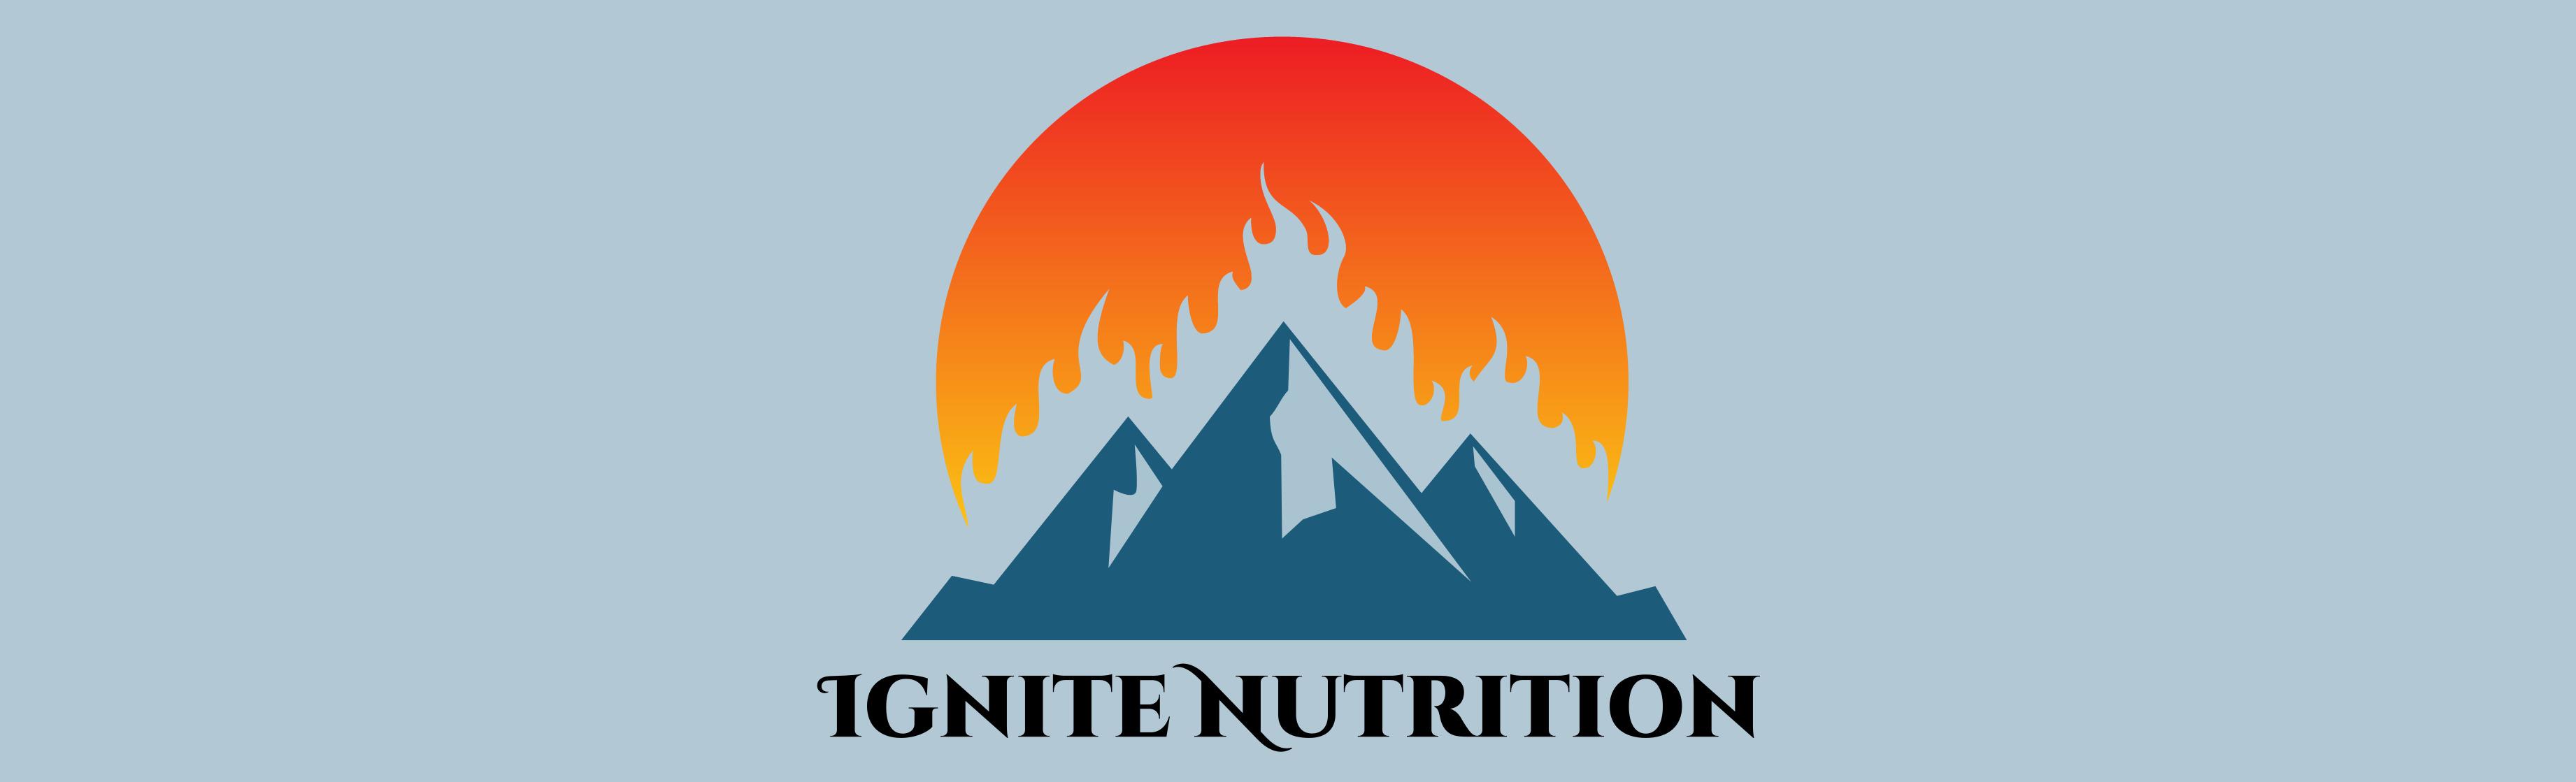 Ignite Nutrition